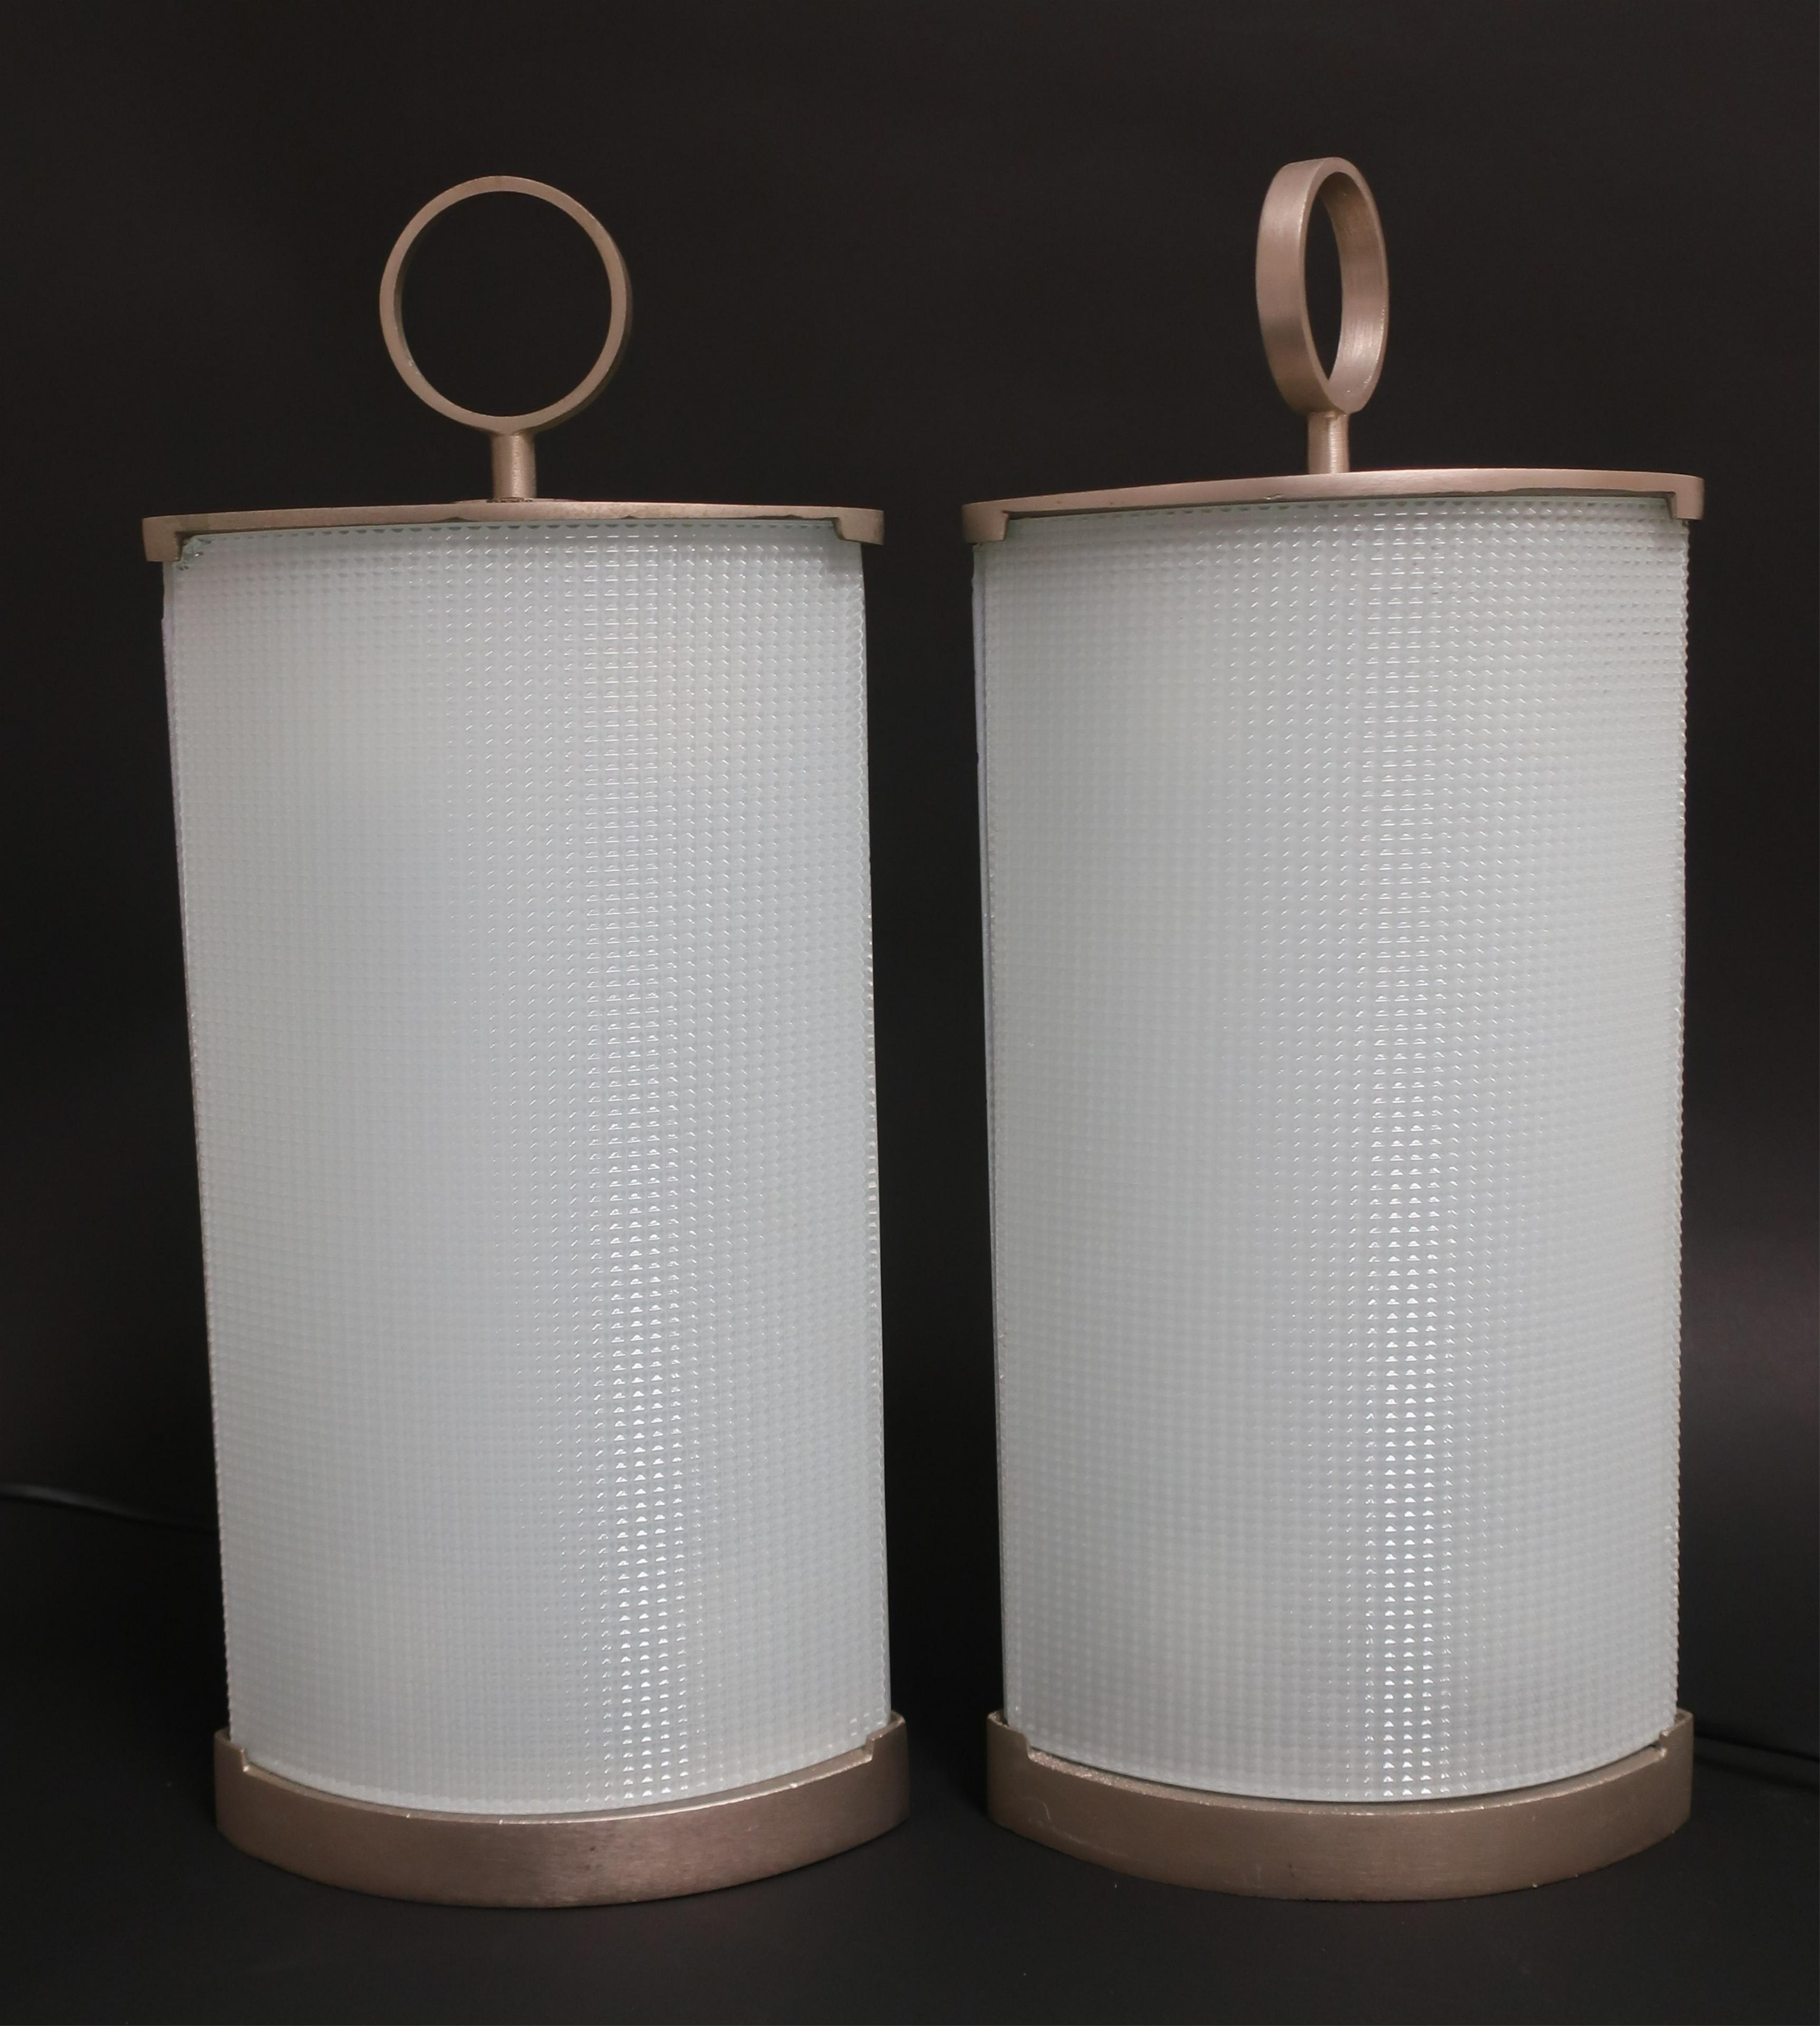 805 Gio Ponti Fontana Arte Pirellina Glass Lamps